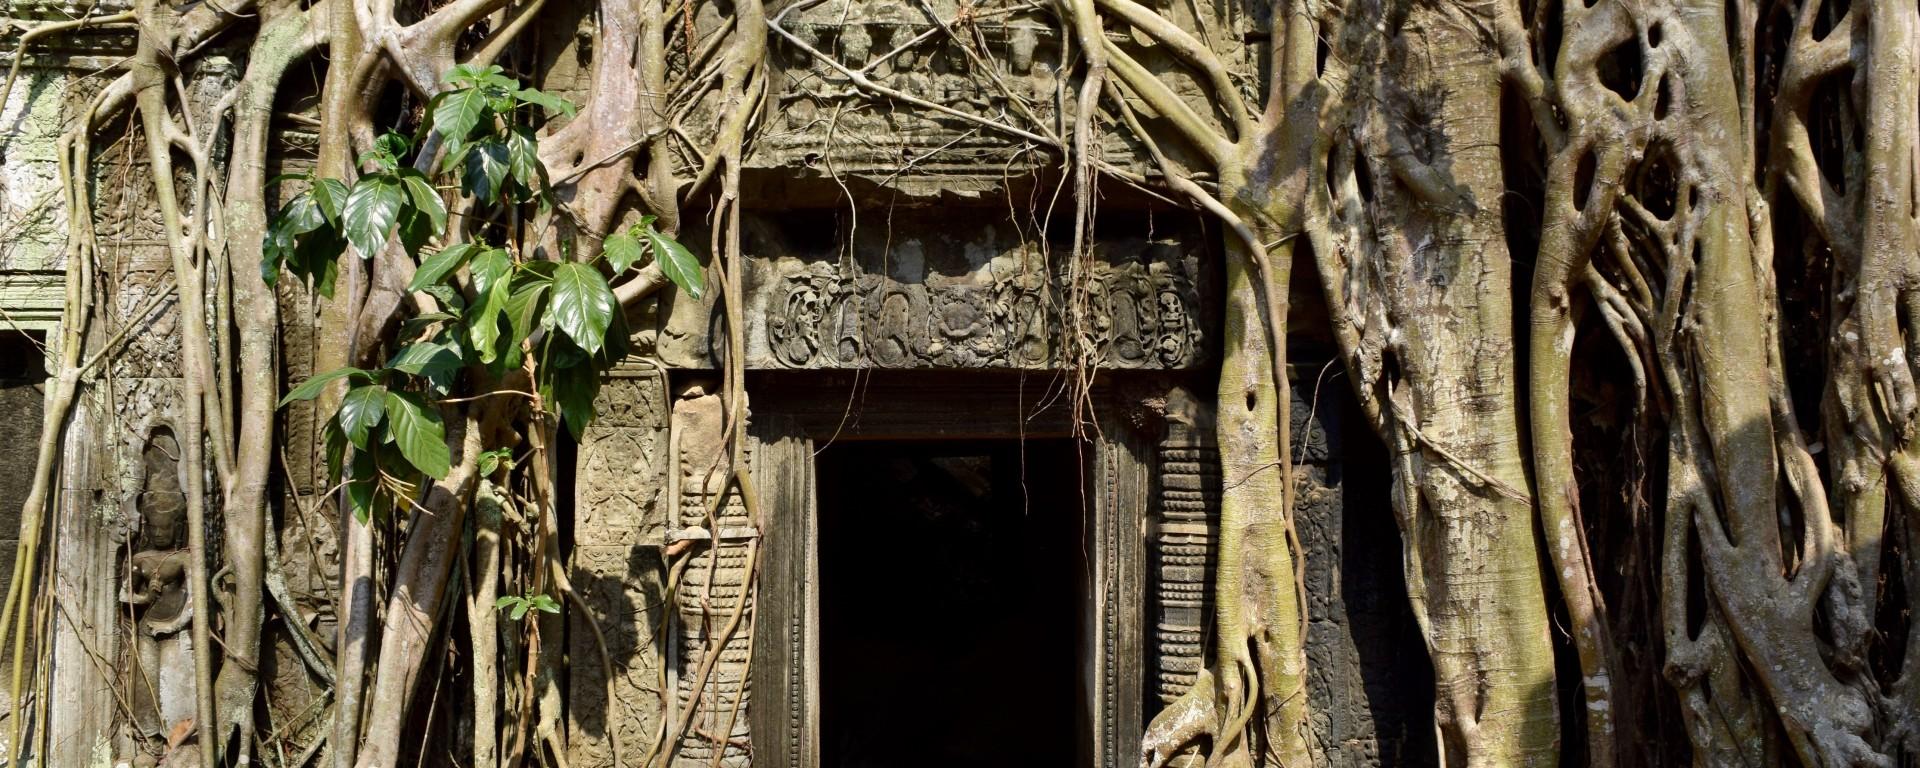 cambodia, temple, nature, travel